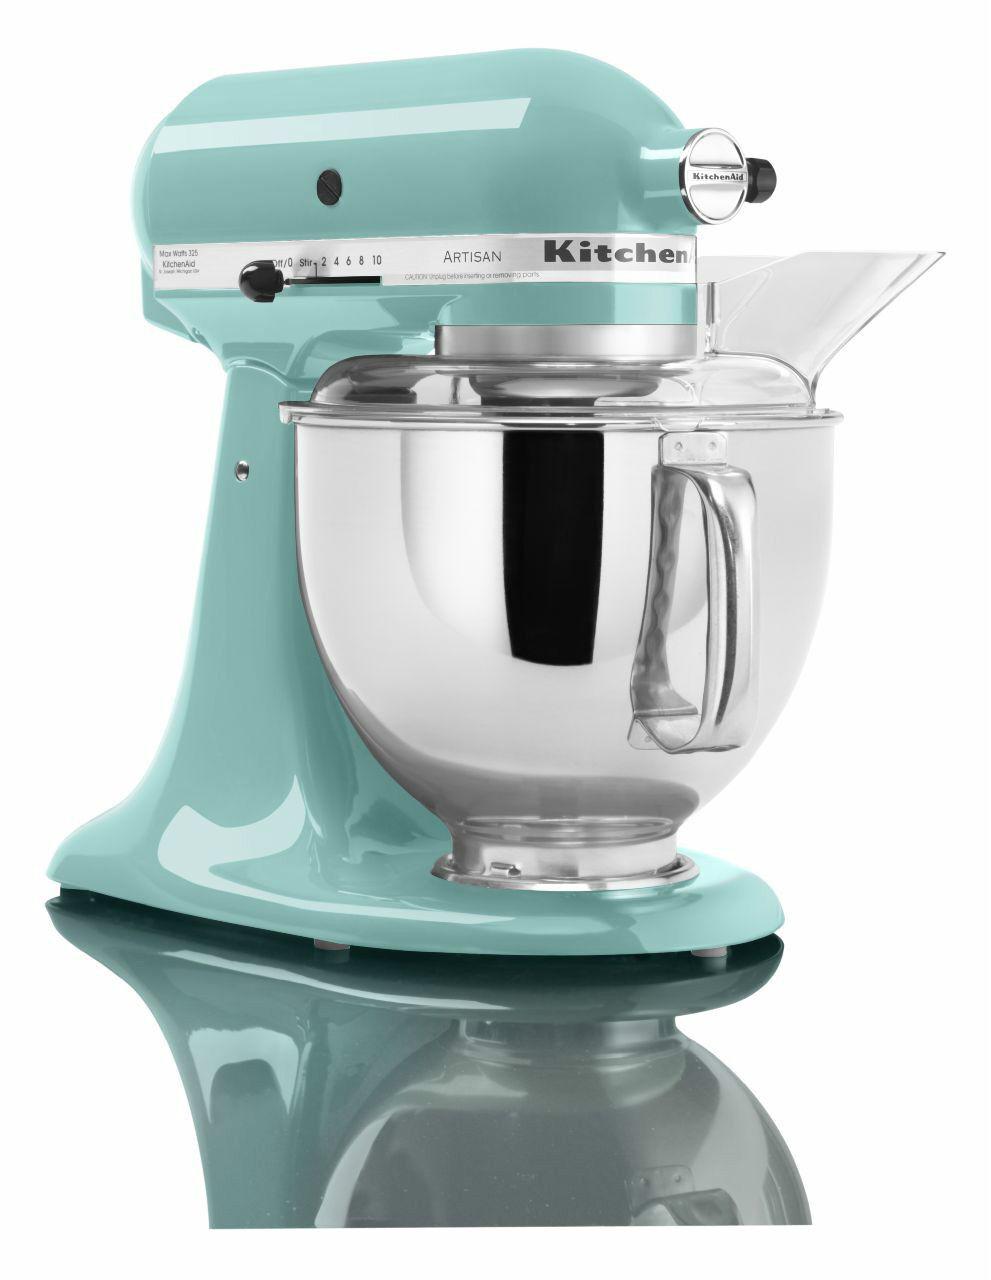 Kitchenaid Martha Stewart Stand Mixer R Ksm150psaq Blue